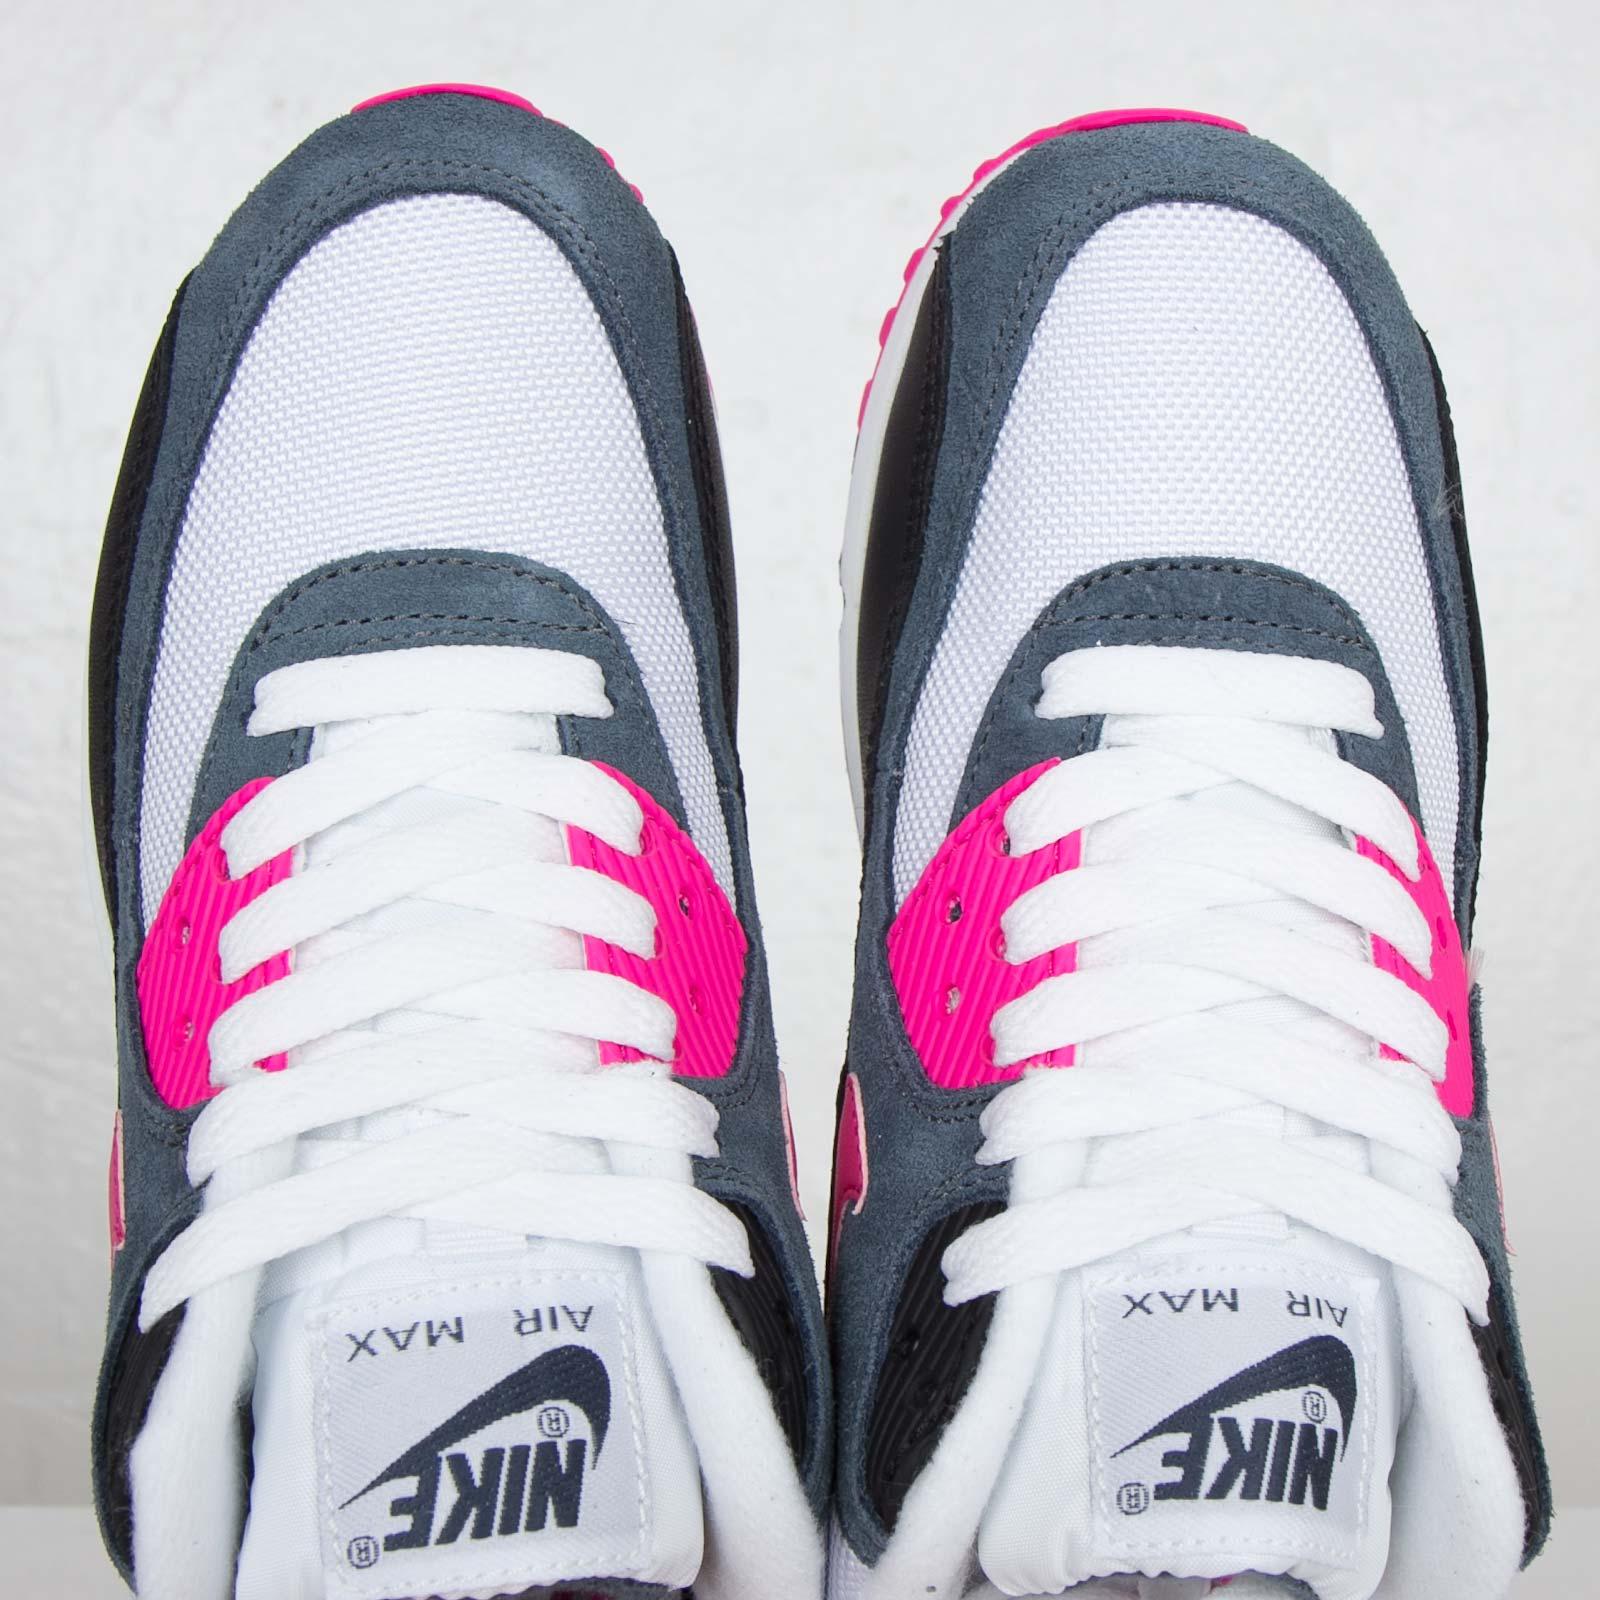 Nike Wmns Air Max 90 Essential 616730 100 Sneakersnstuff